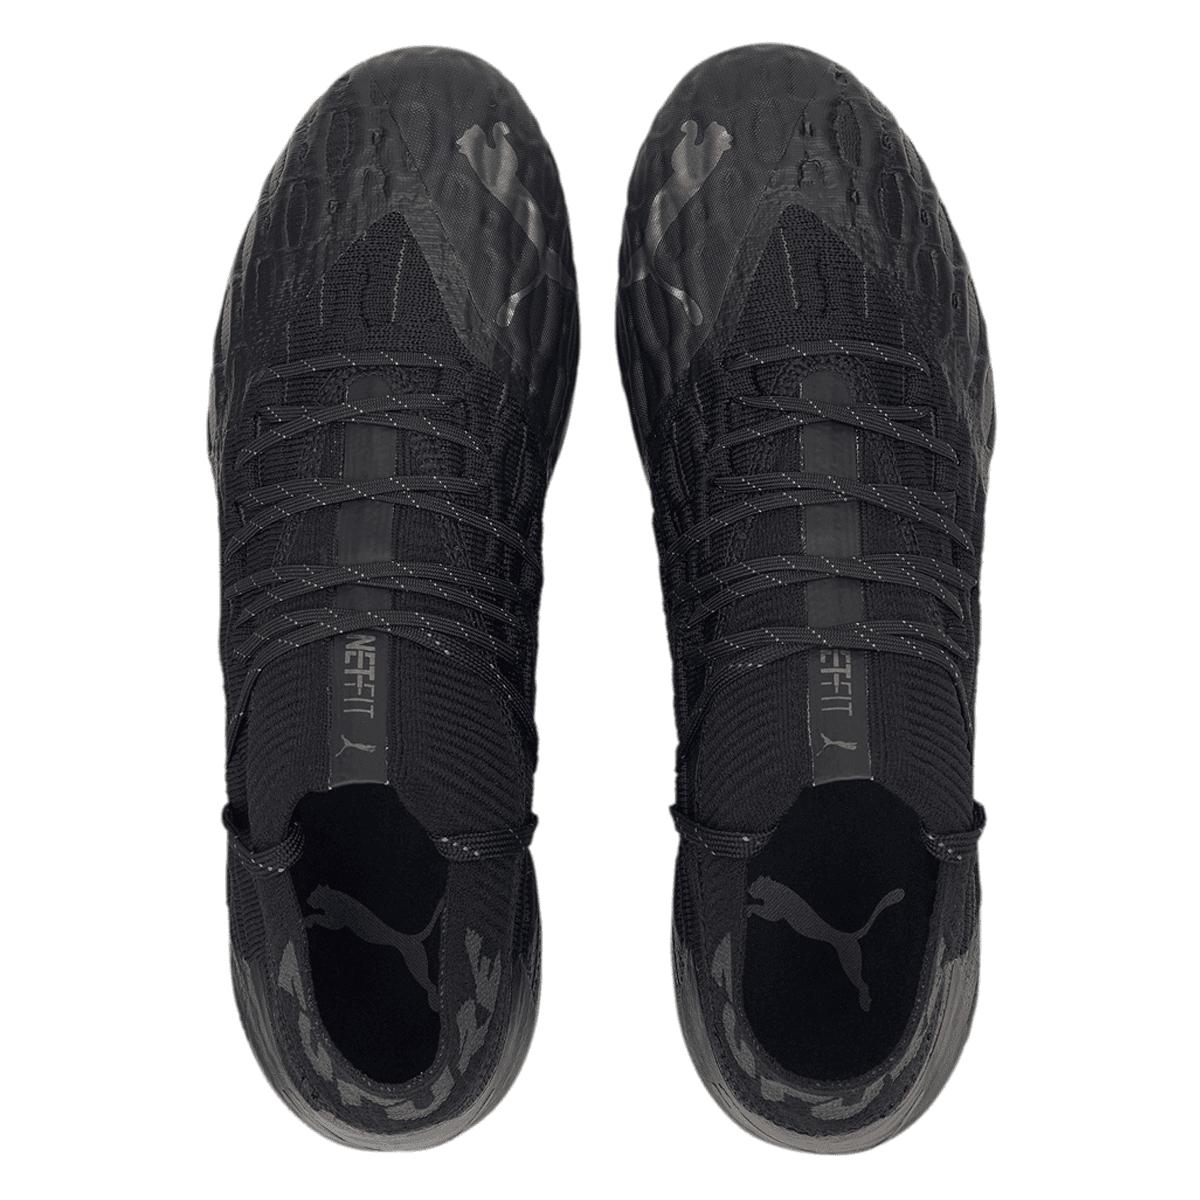 Puma buty piłkarskie Future 5.1 Netfit FGAG czarneantracyt